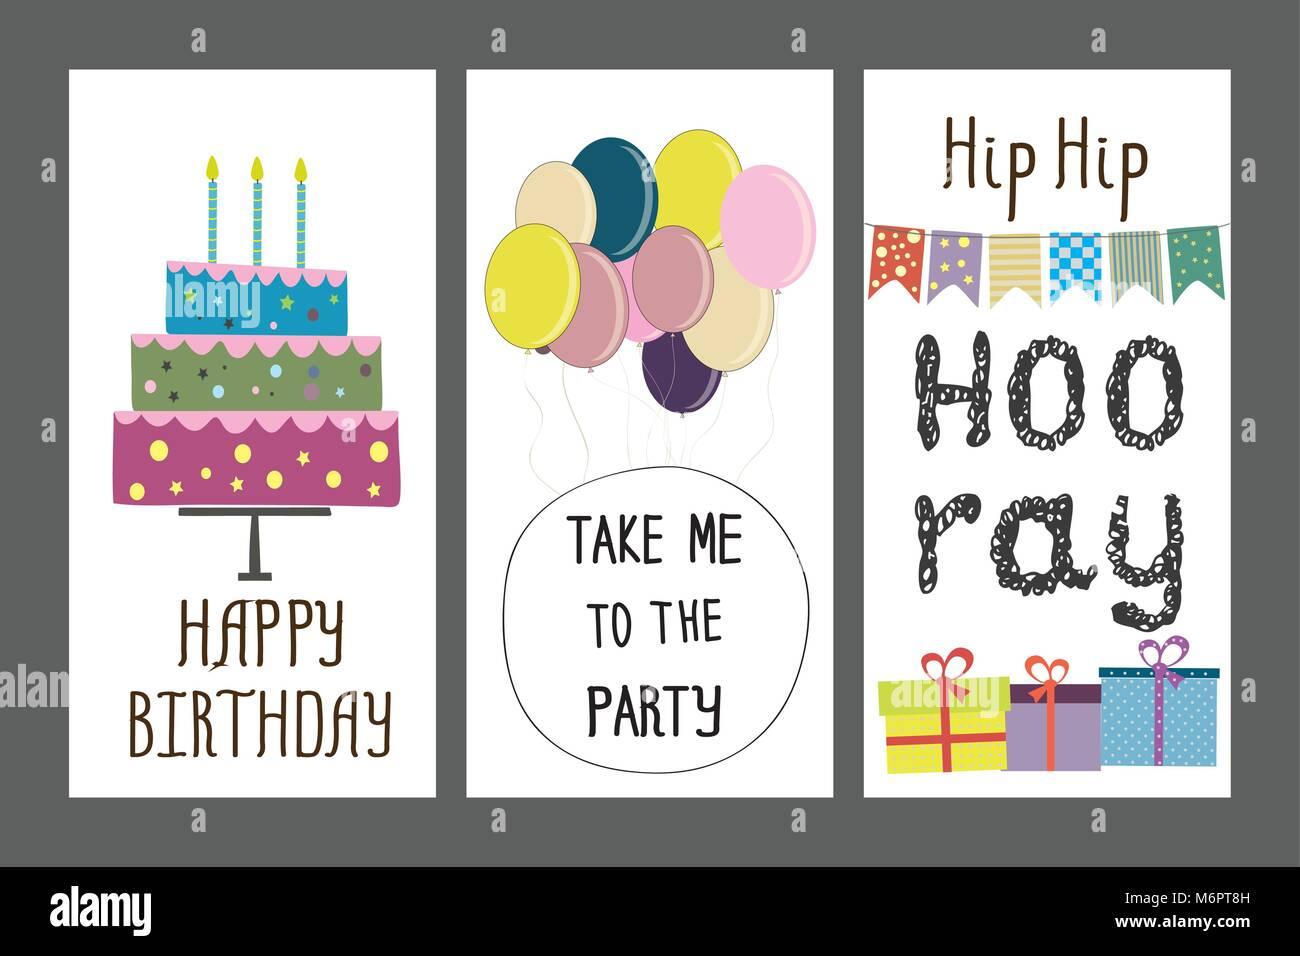 Happy Birthday Holiday Greeting And Invitation Card